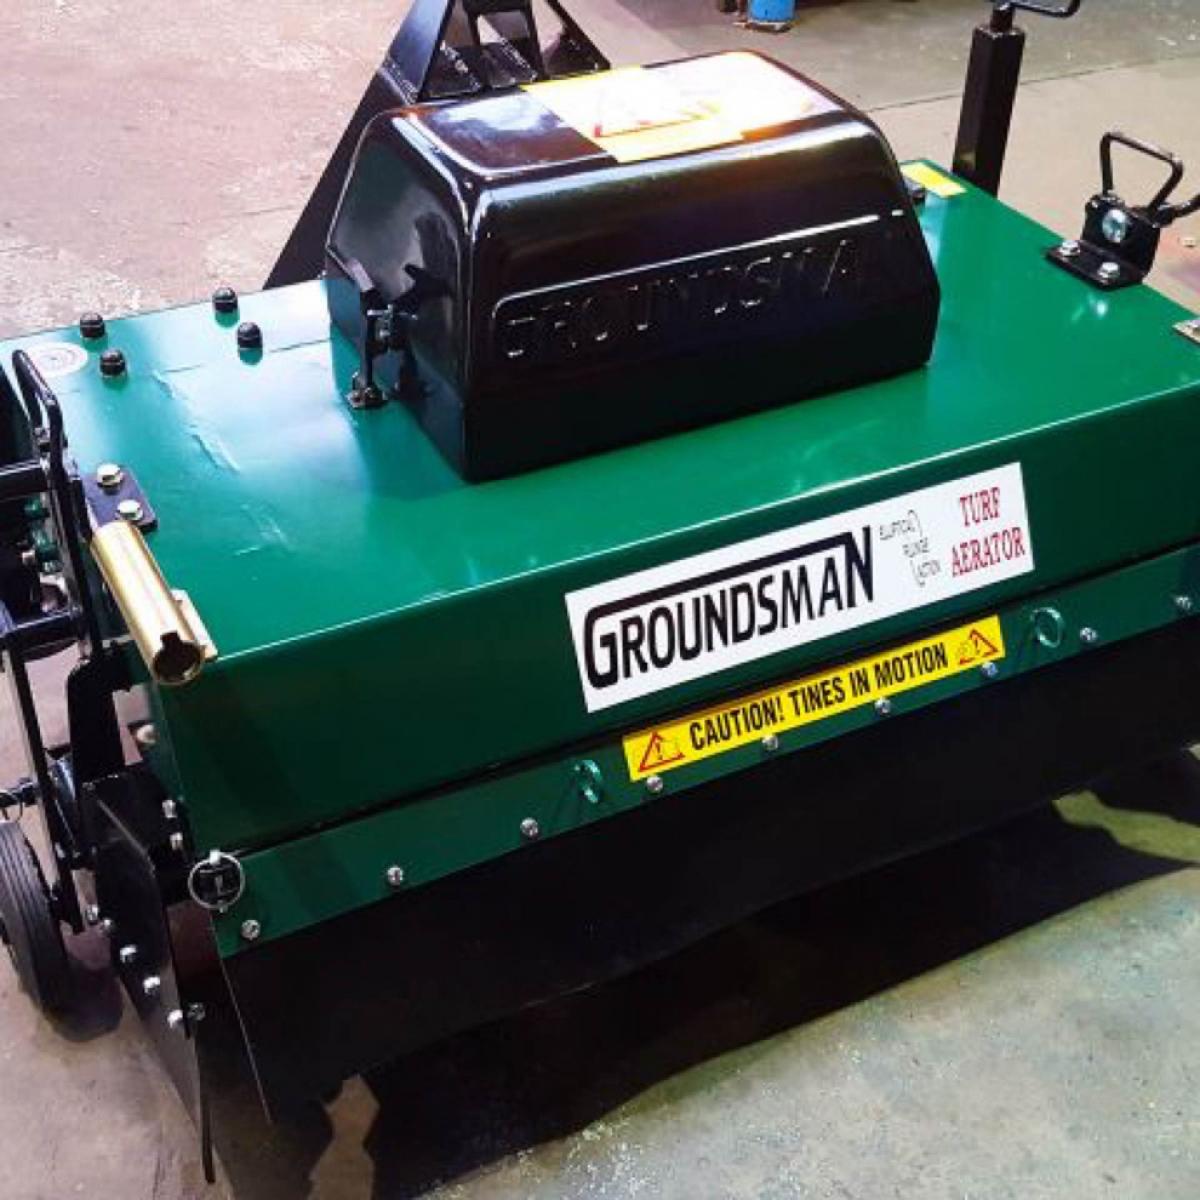 Groundsman 8120 Tractor-mounted Aerator